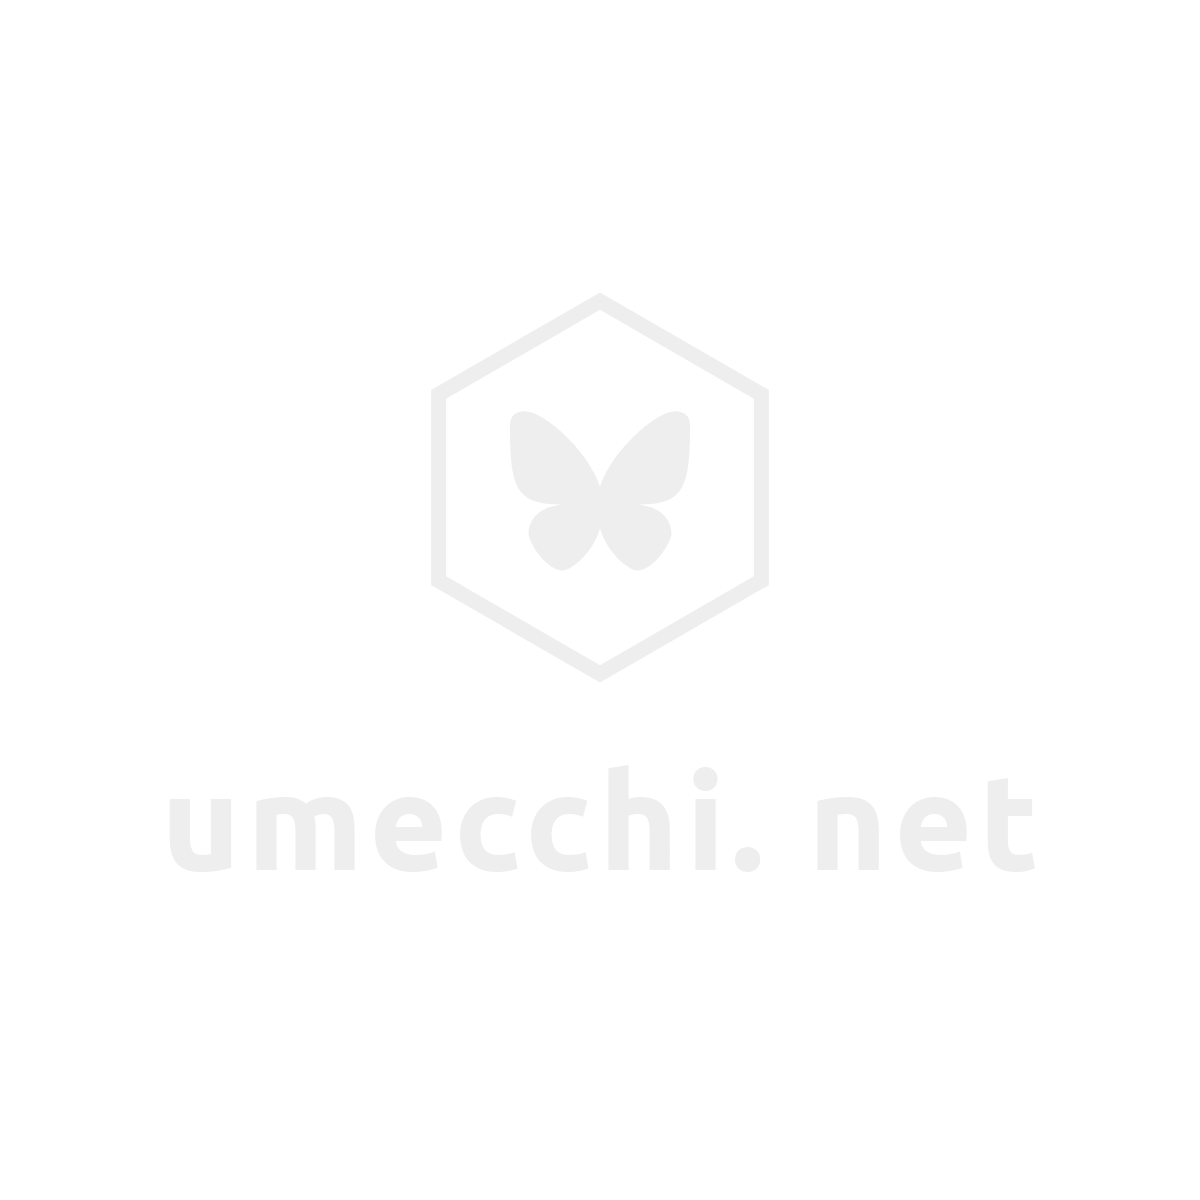 umecchi.net